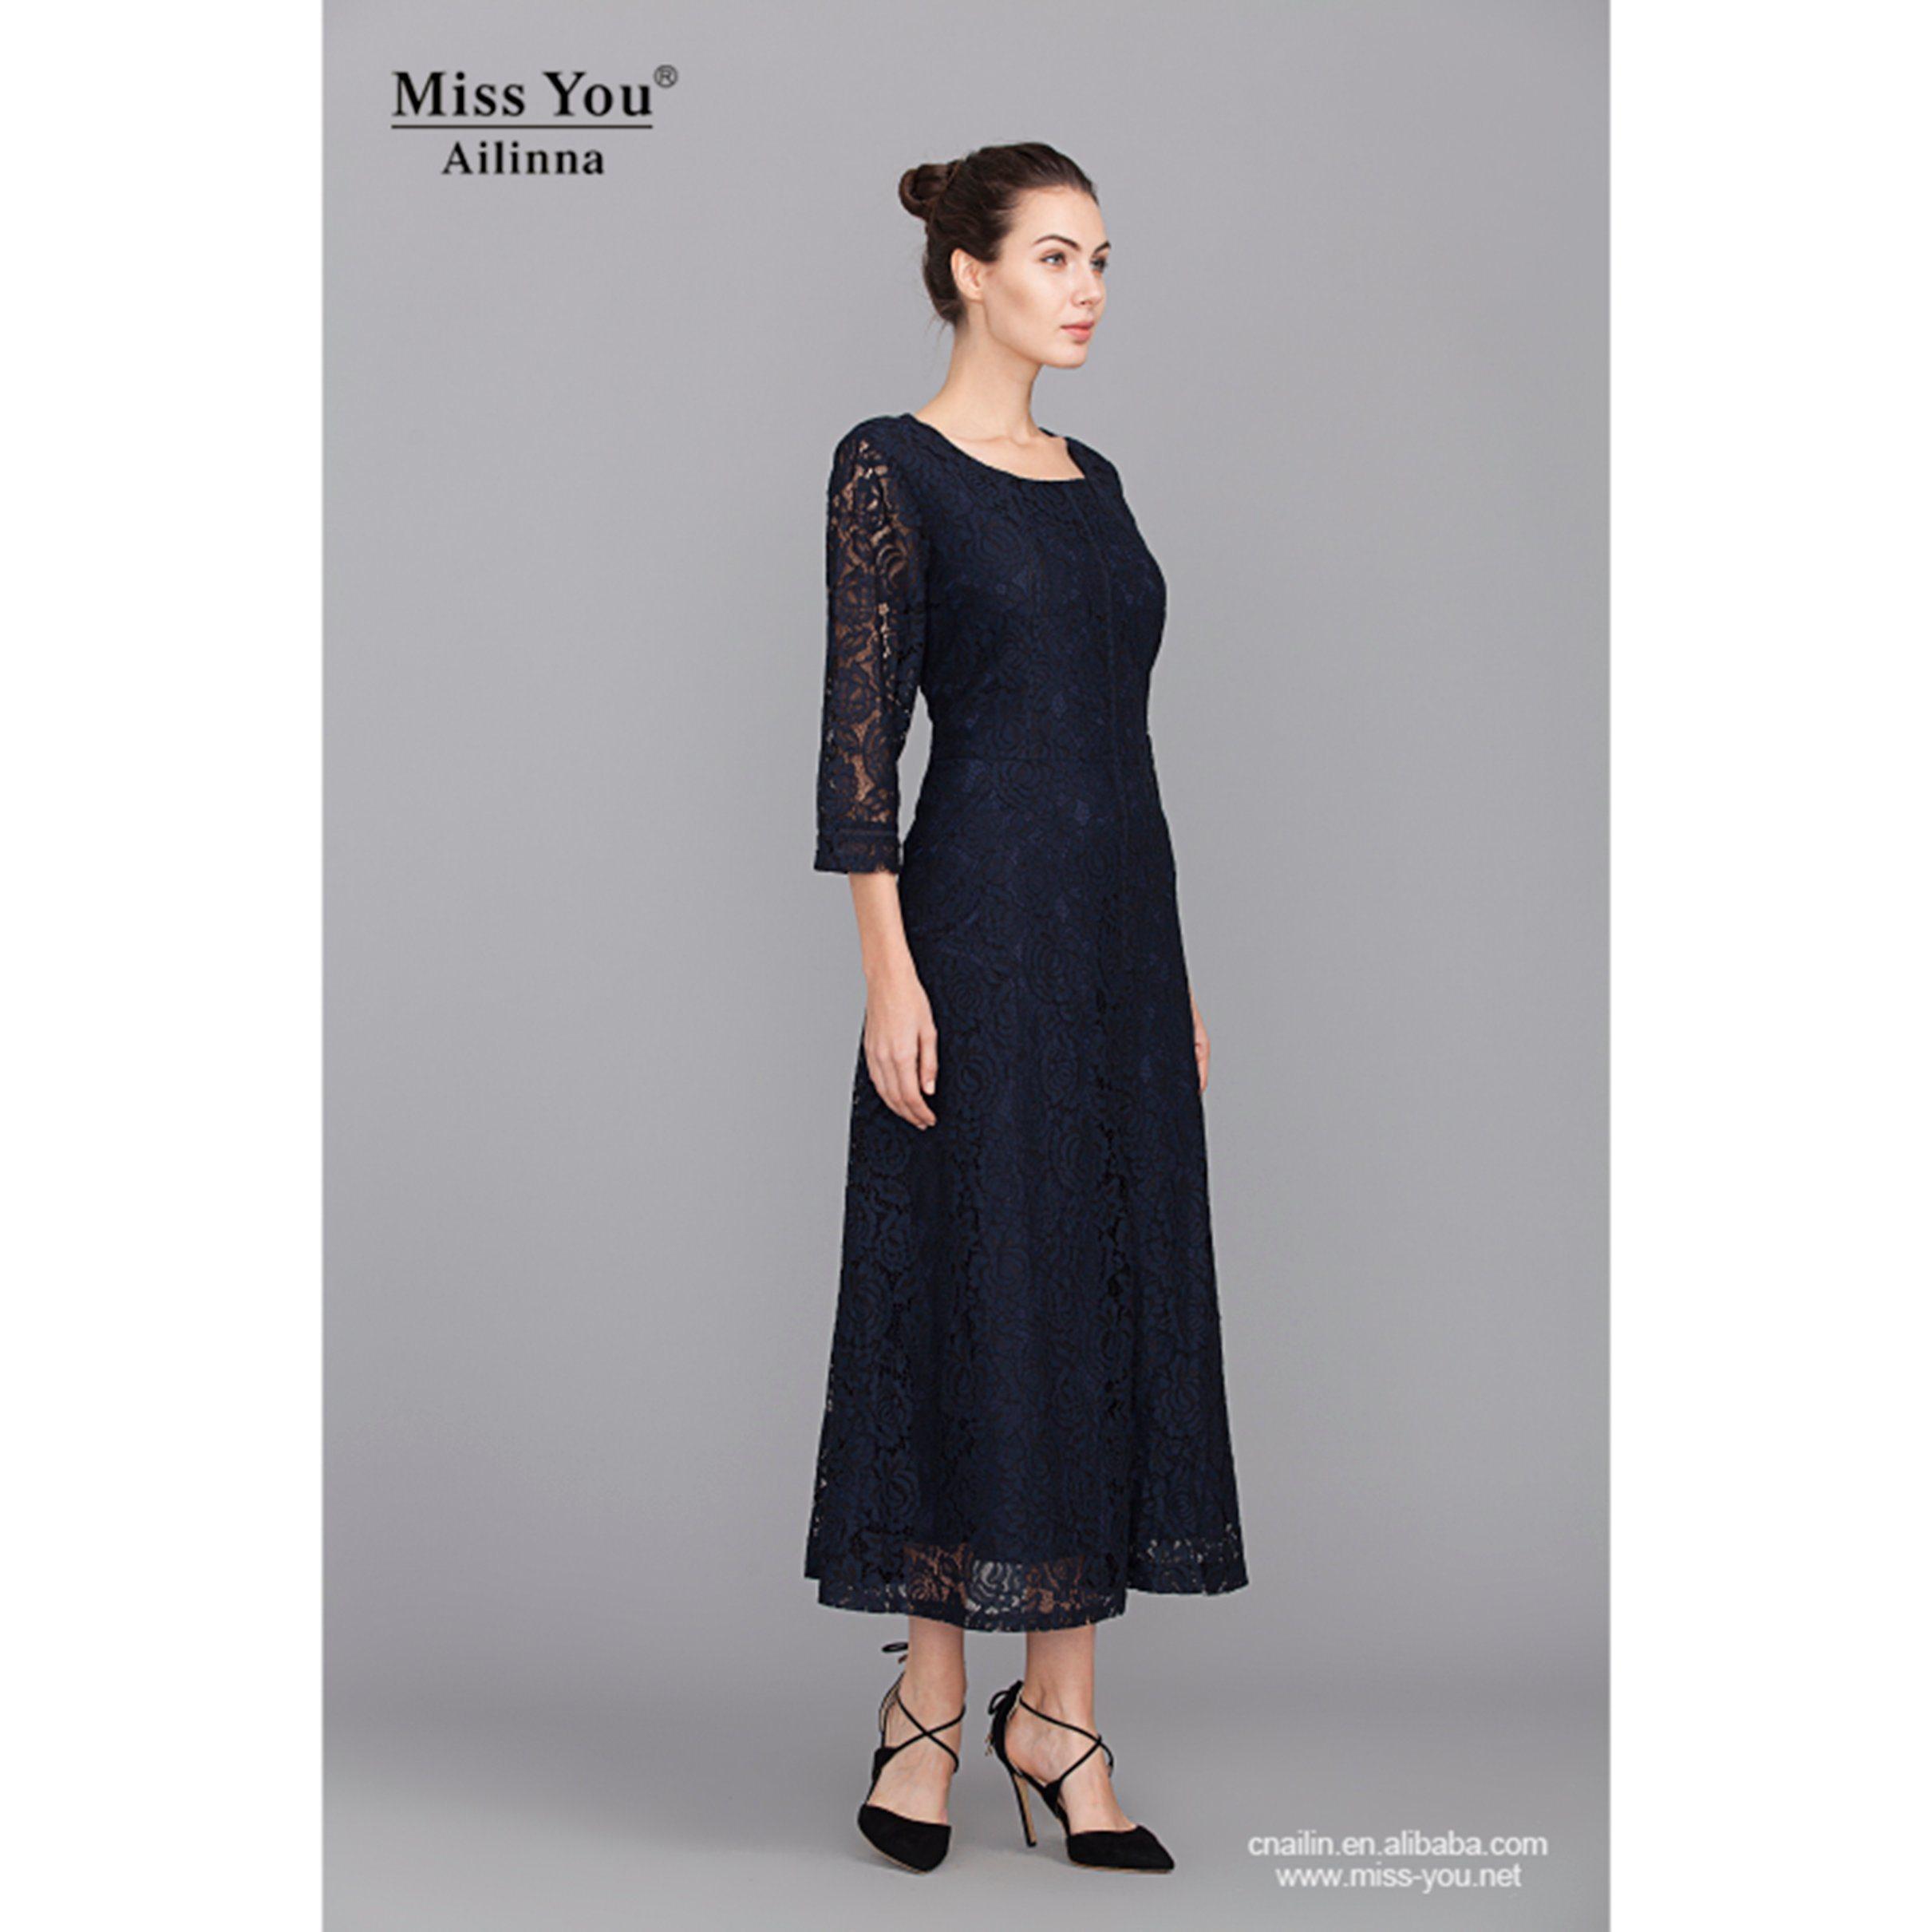 Miss You Ailinna 801945 Lace Ladies Evening Dress African Kitenge Designs